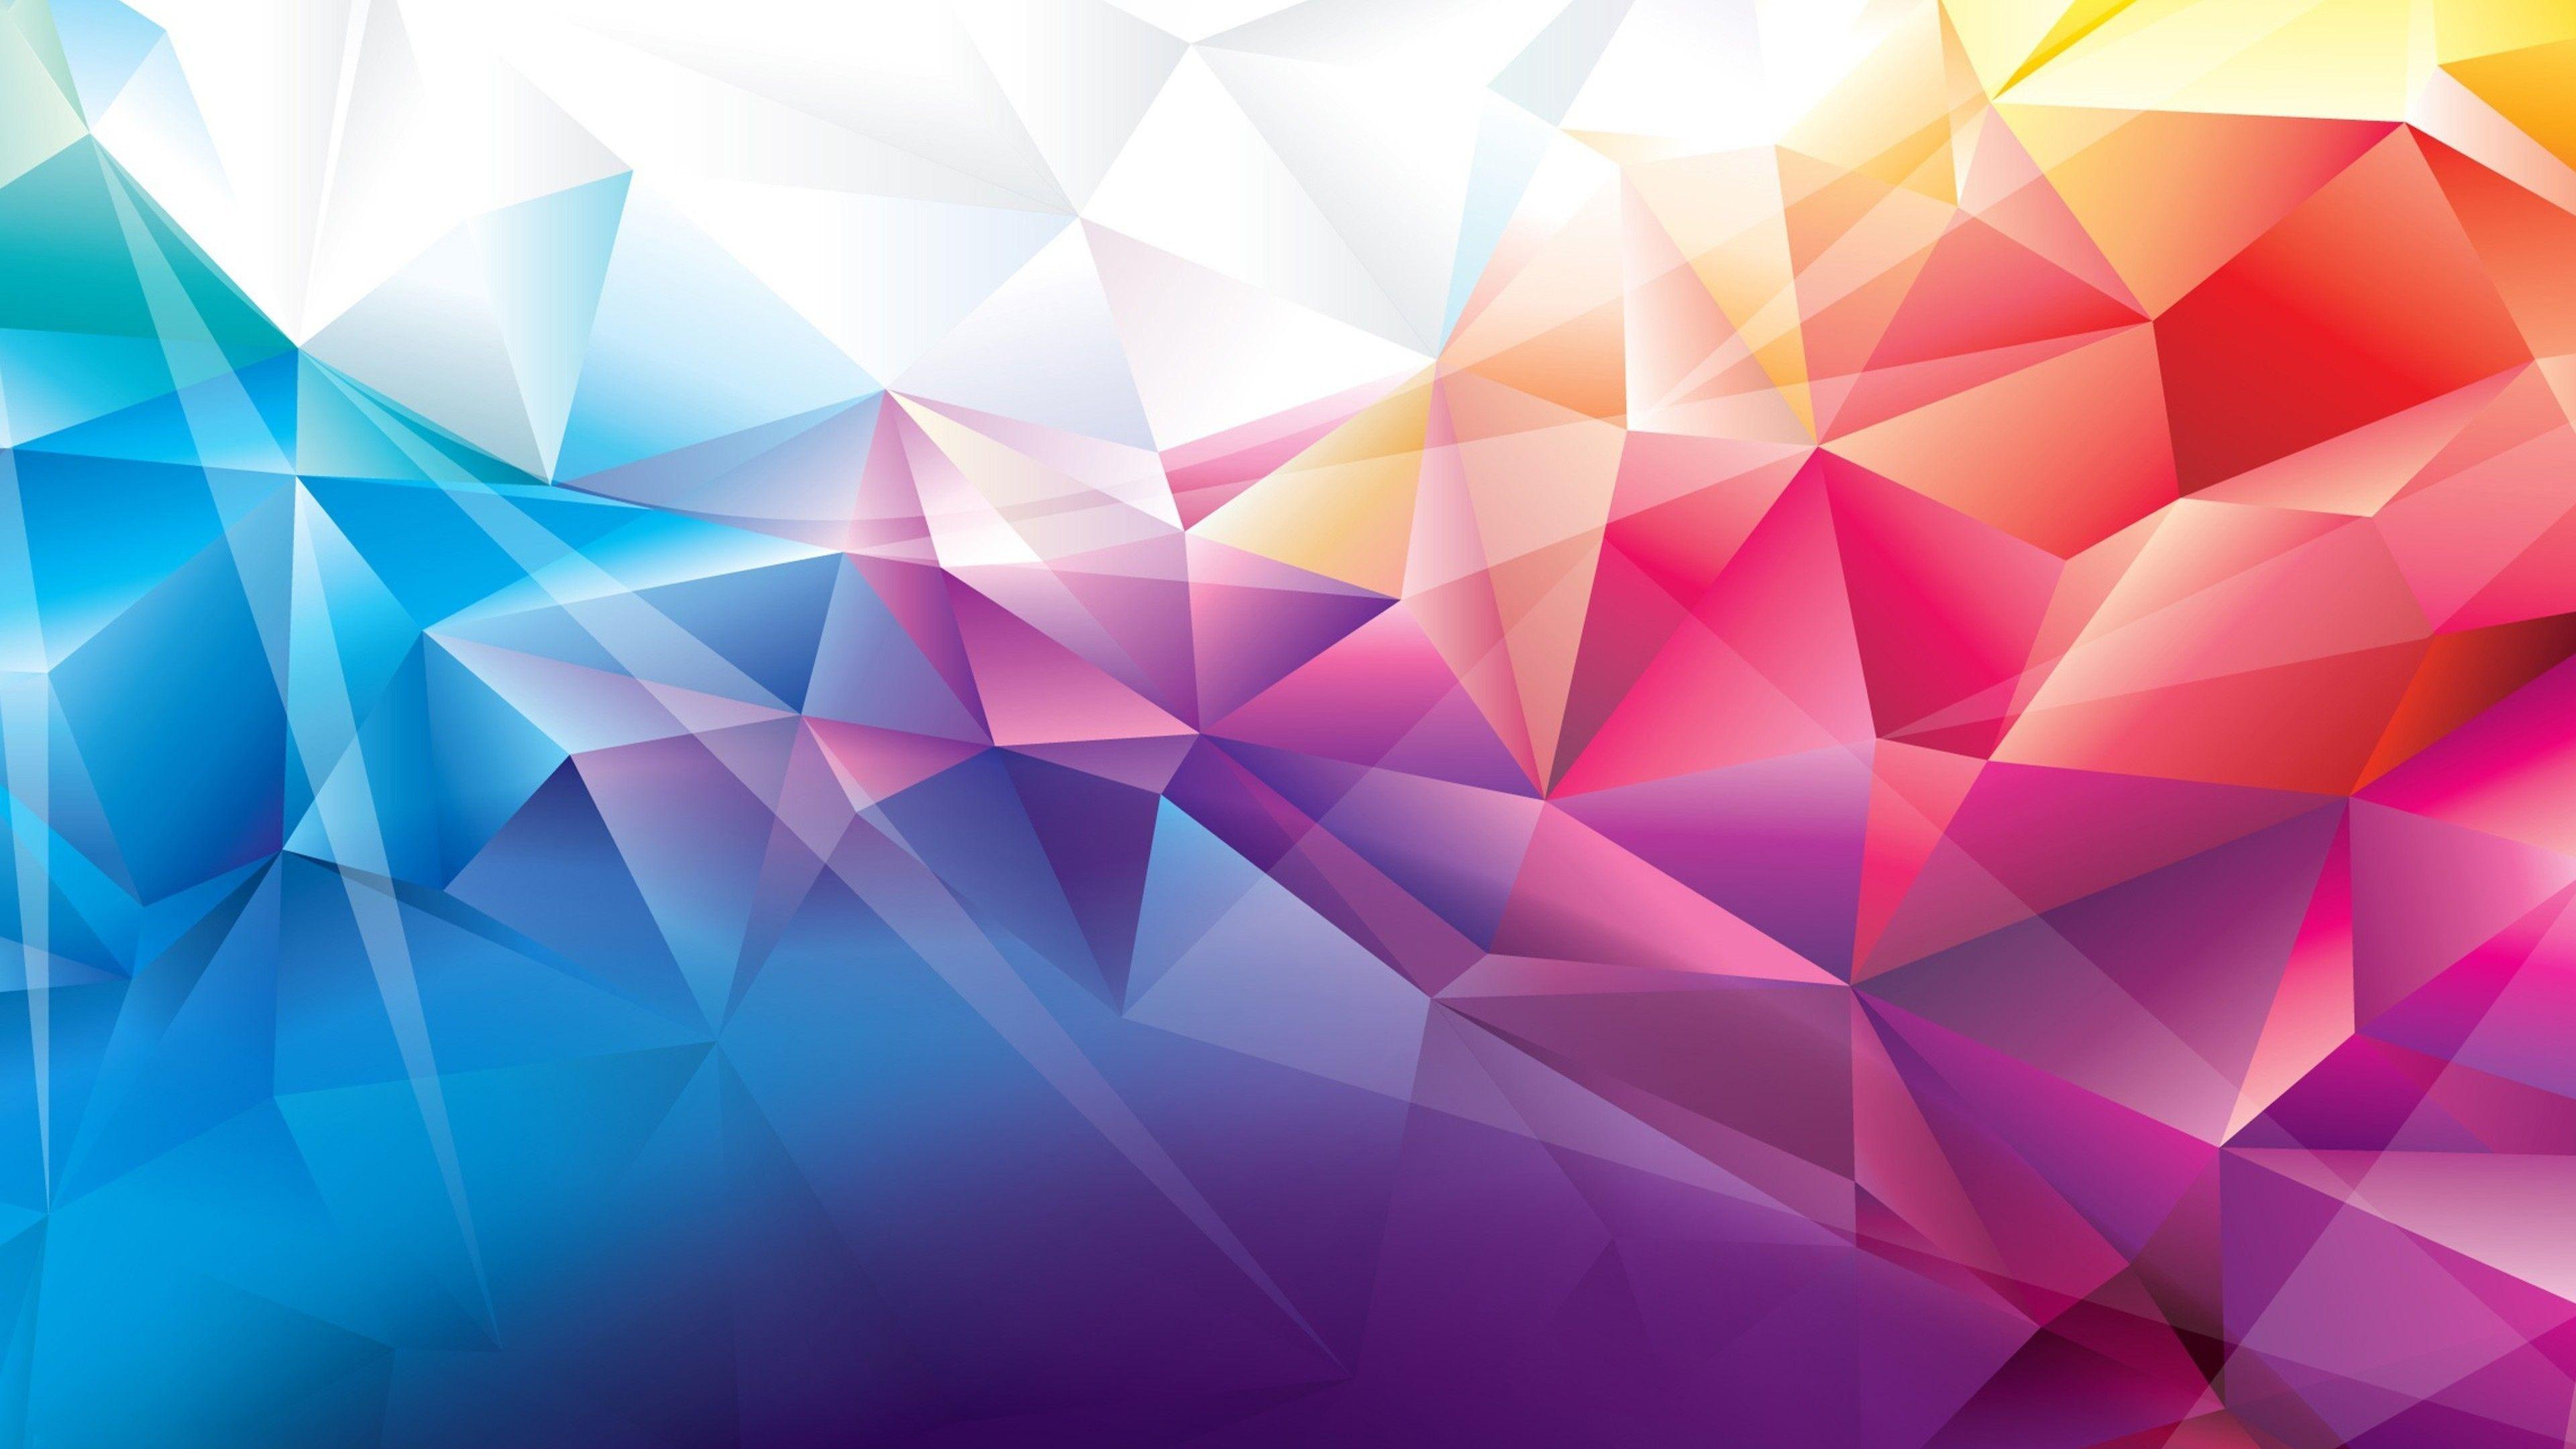 Colorful Polygons Jpg 3840 2160 Abstract Abstract Wallpaper Wallpaper Windows 10